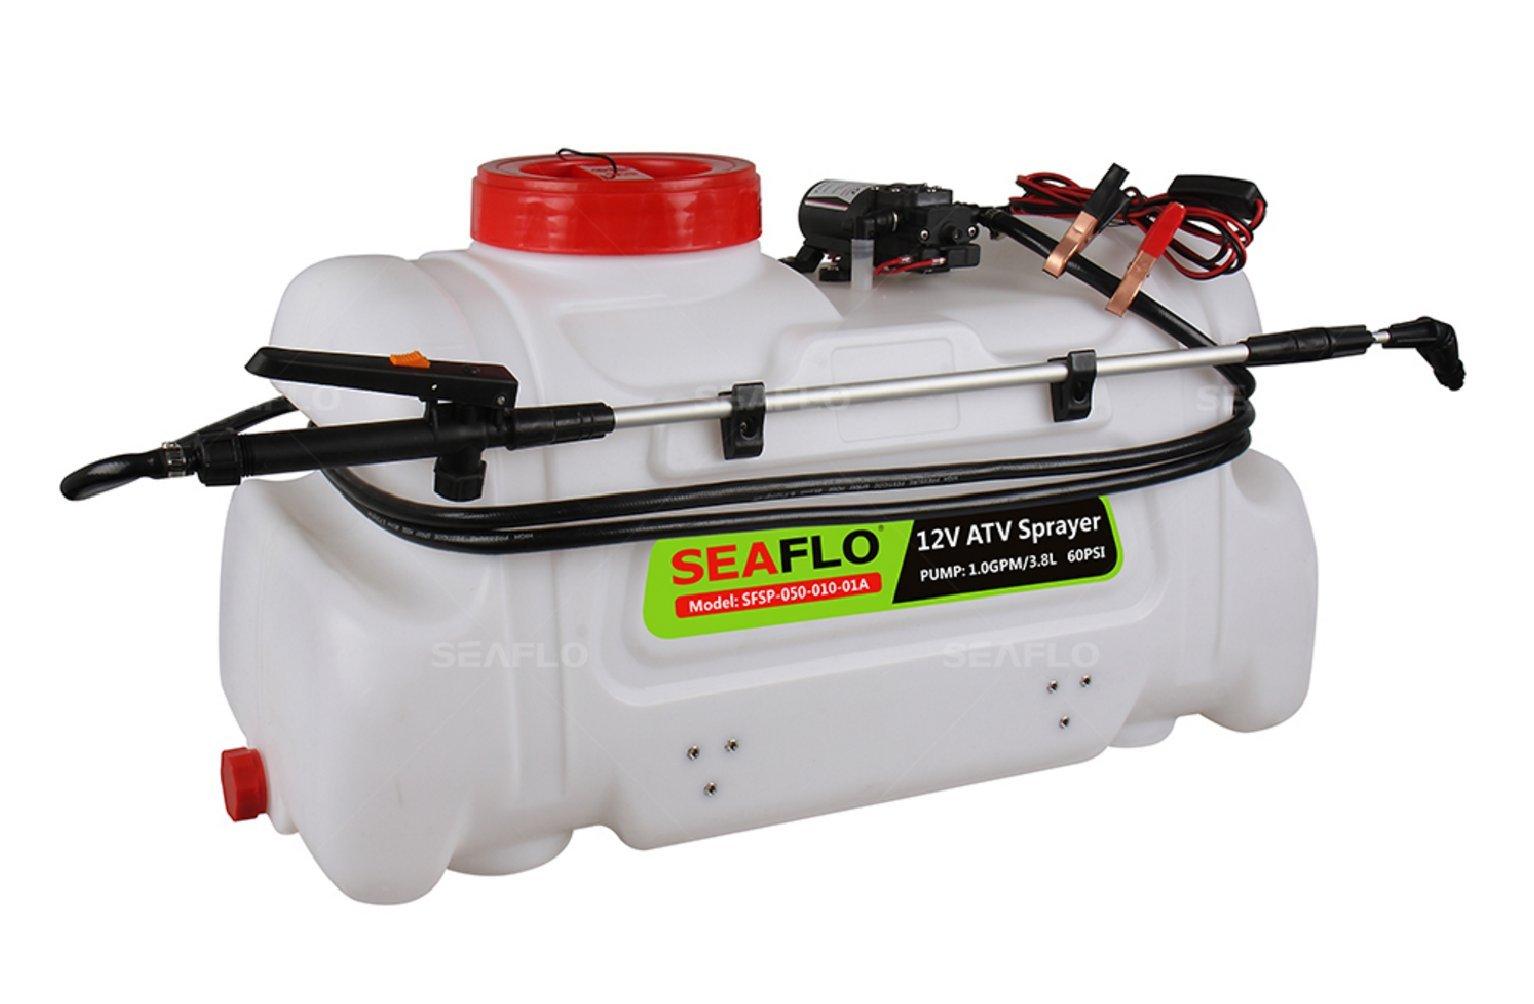 Seaflo ATV Spot Sprayer - 12 Volt, 1 GPM, 13 Gallon